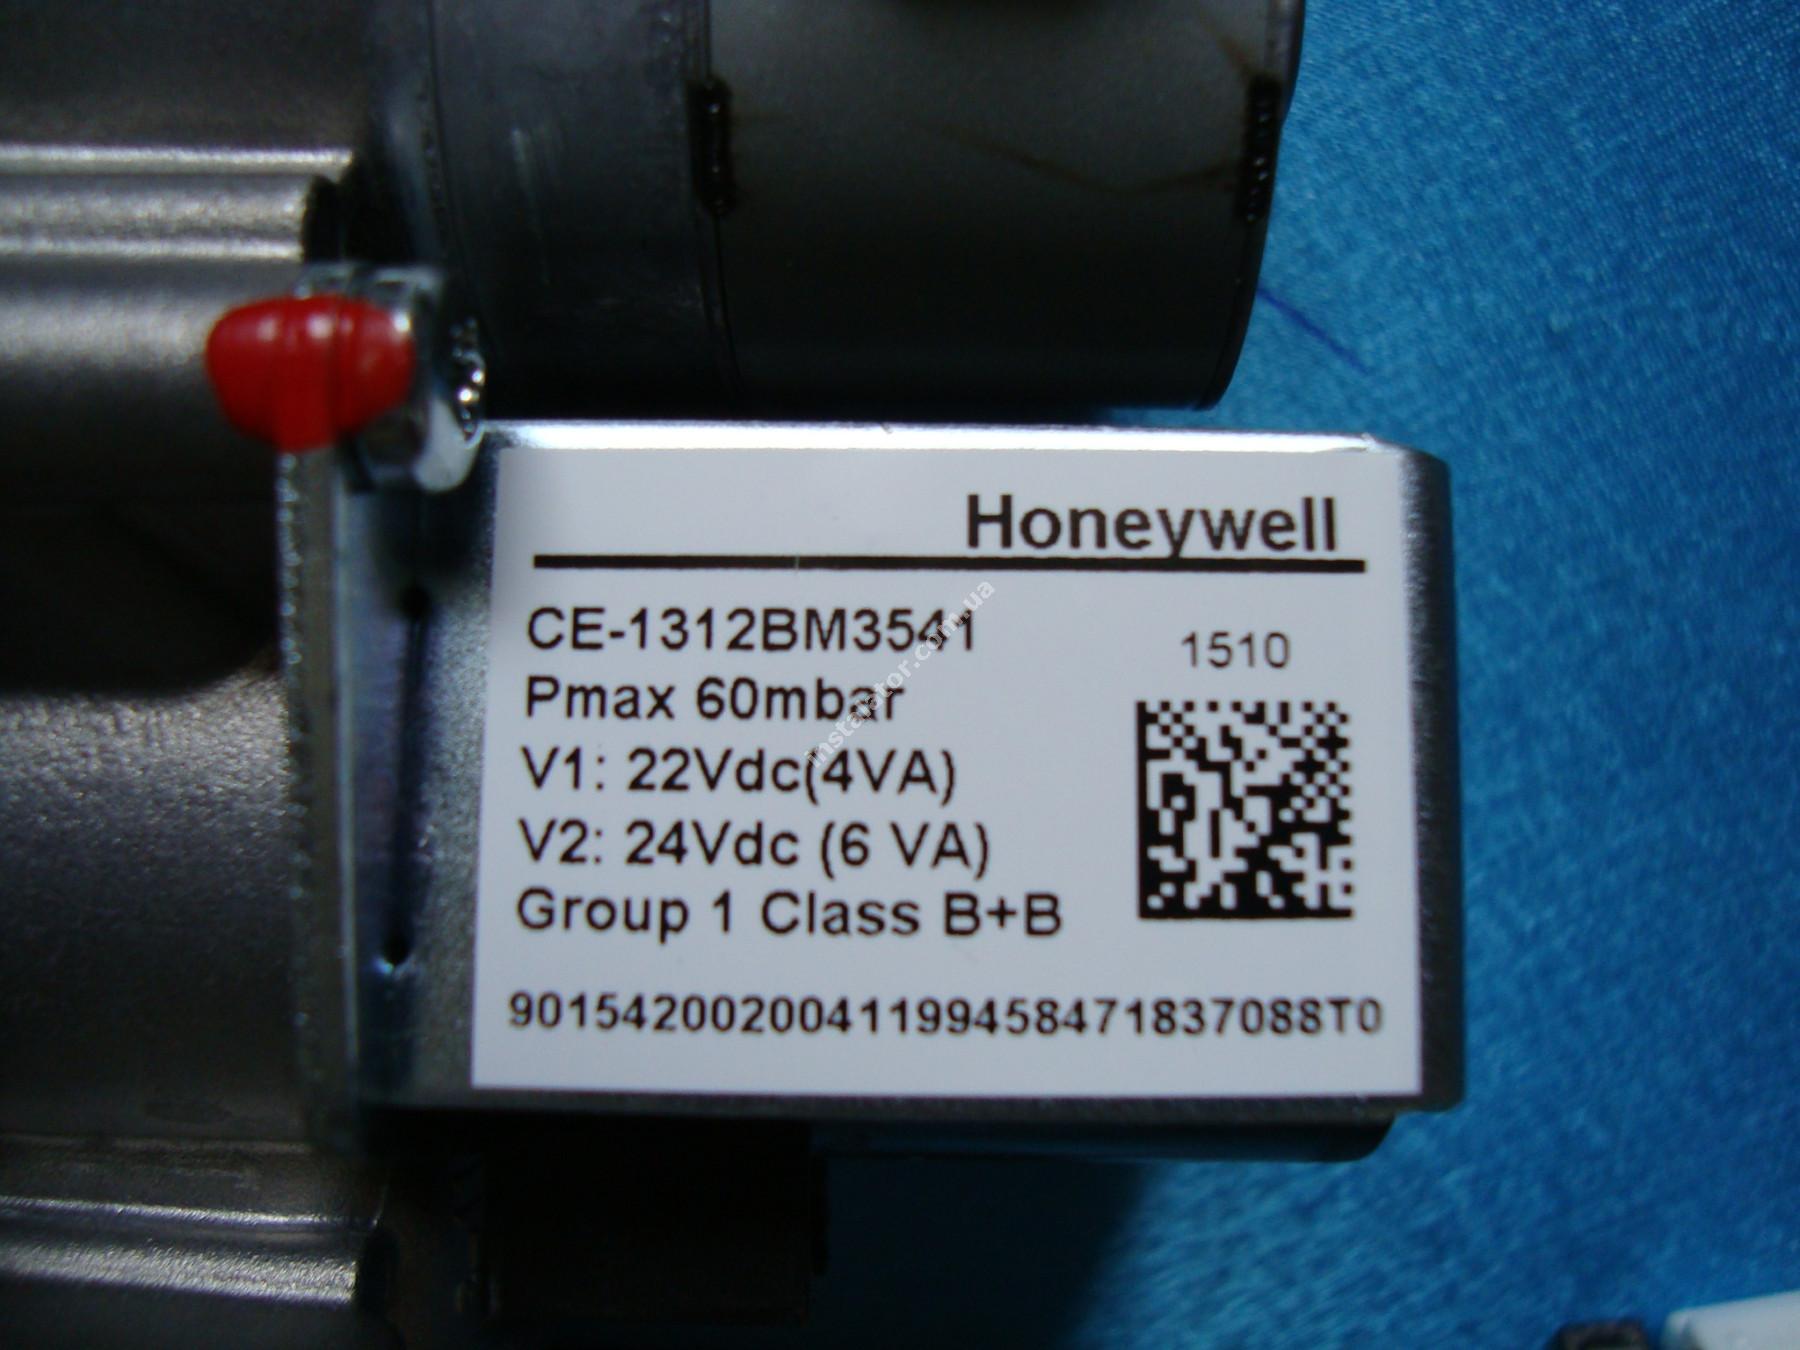 0020035639 Газовий клапан без регулятора PROTHERM, SAUNIER DUVAL (Honeywell) full-image-4